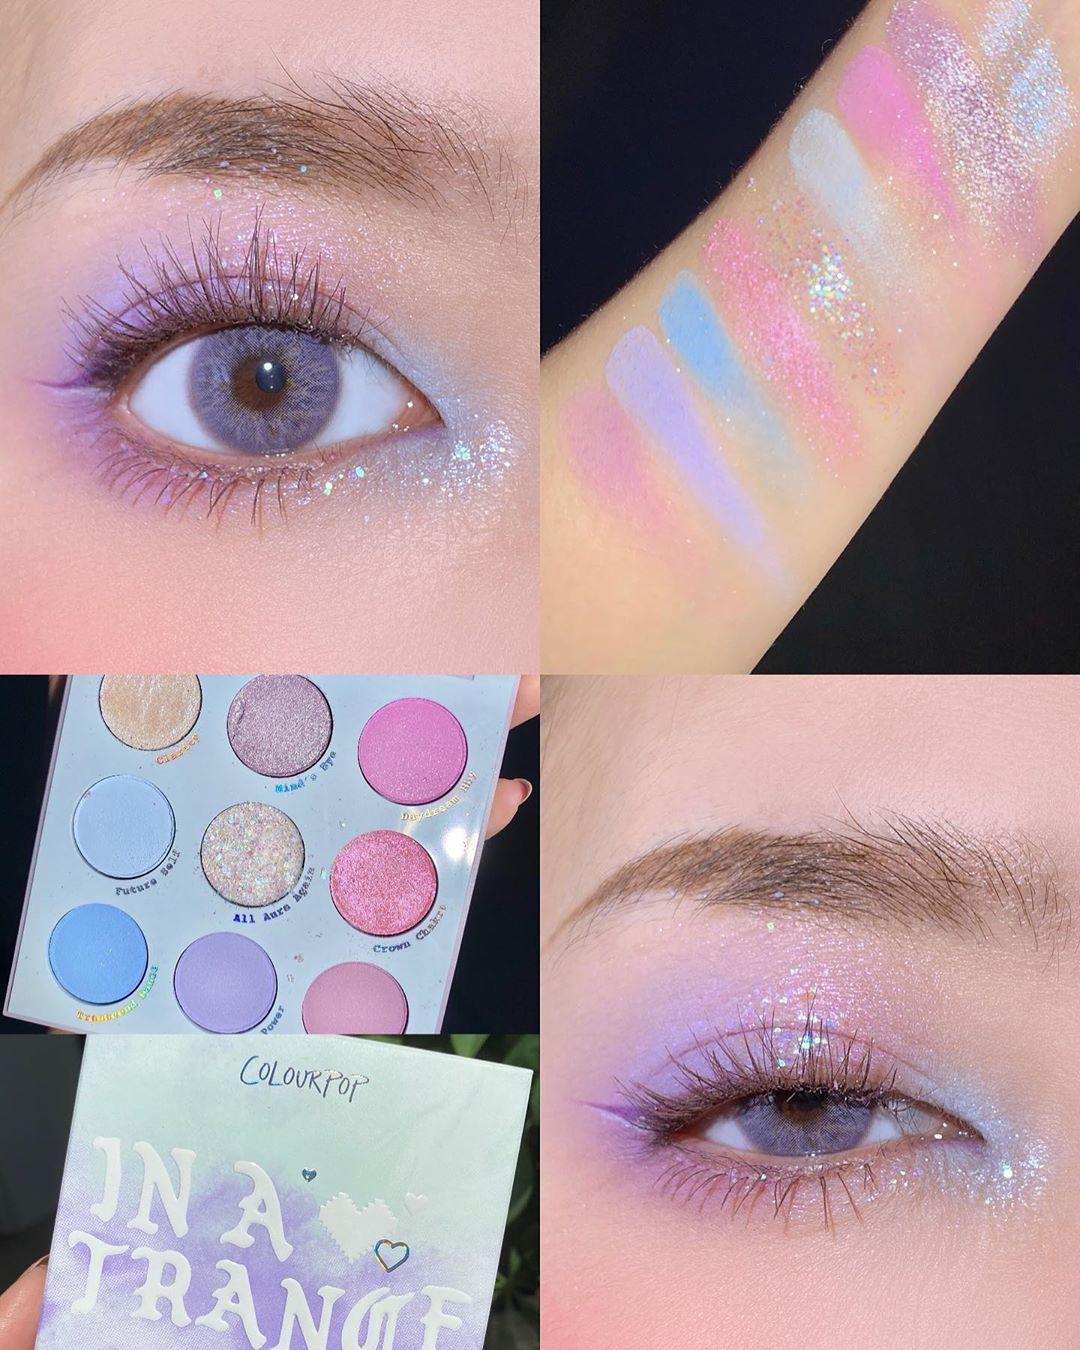 336 In Search Of Ideas In 2021 Colourpop Cosmetics Bath N Body Works Colourpop Eyeshadow